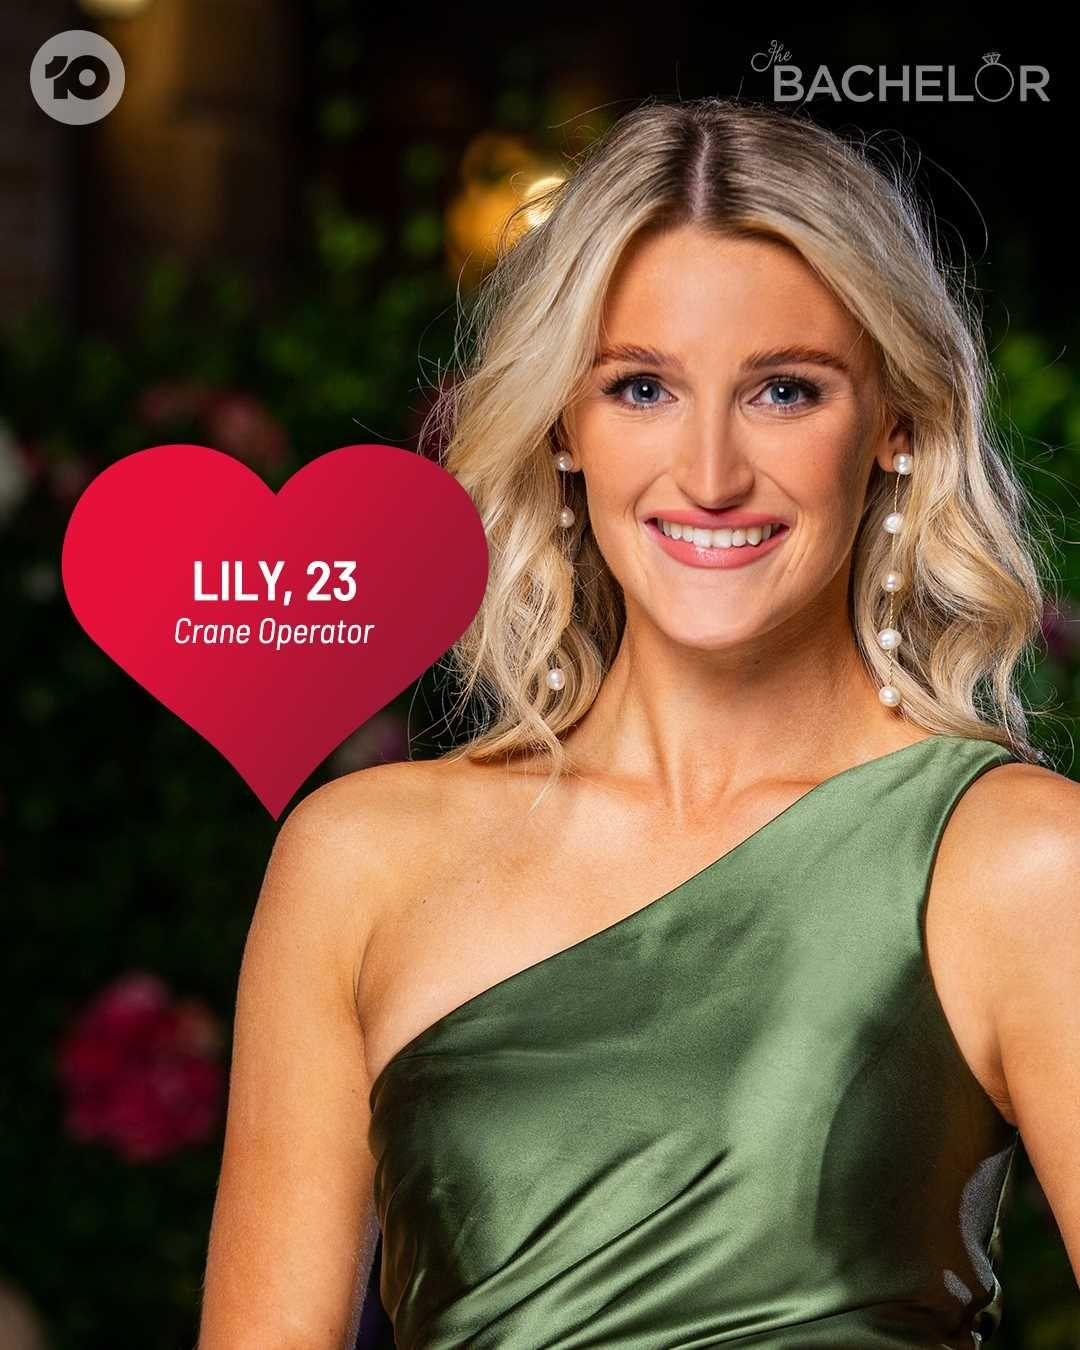 Bachelor Australia - Season 9 - Jimmy Nicholson - Lily Price - *Sleuthing Spoilers* 21312010